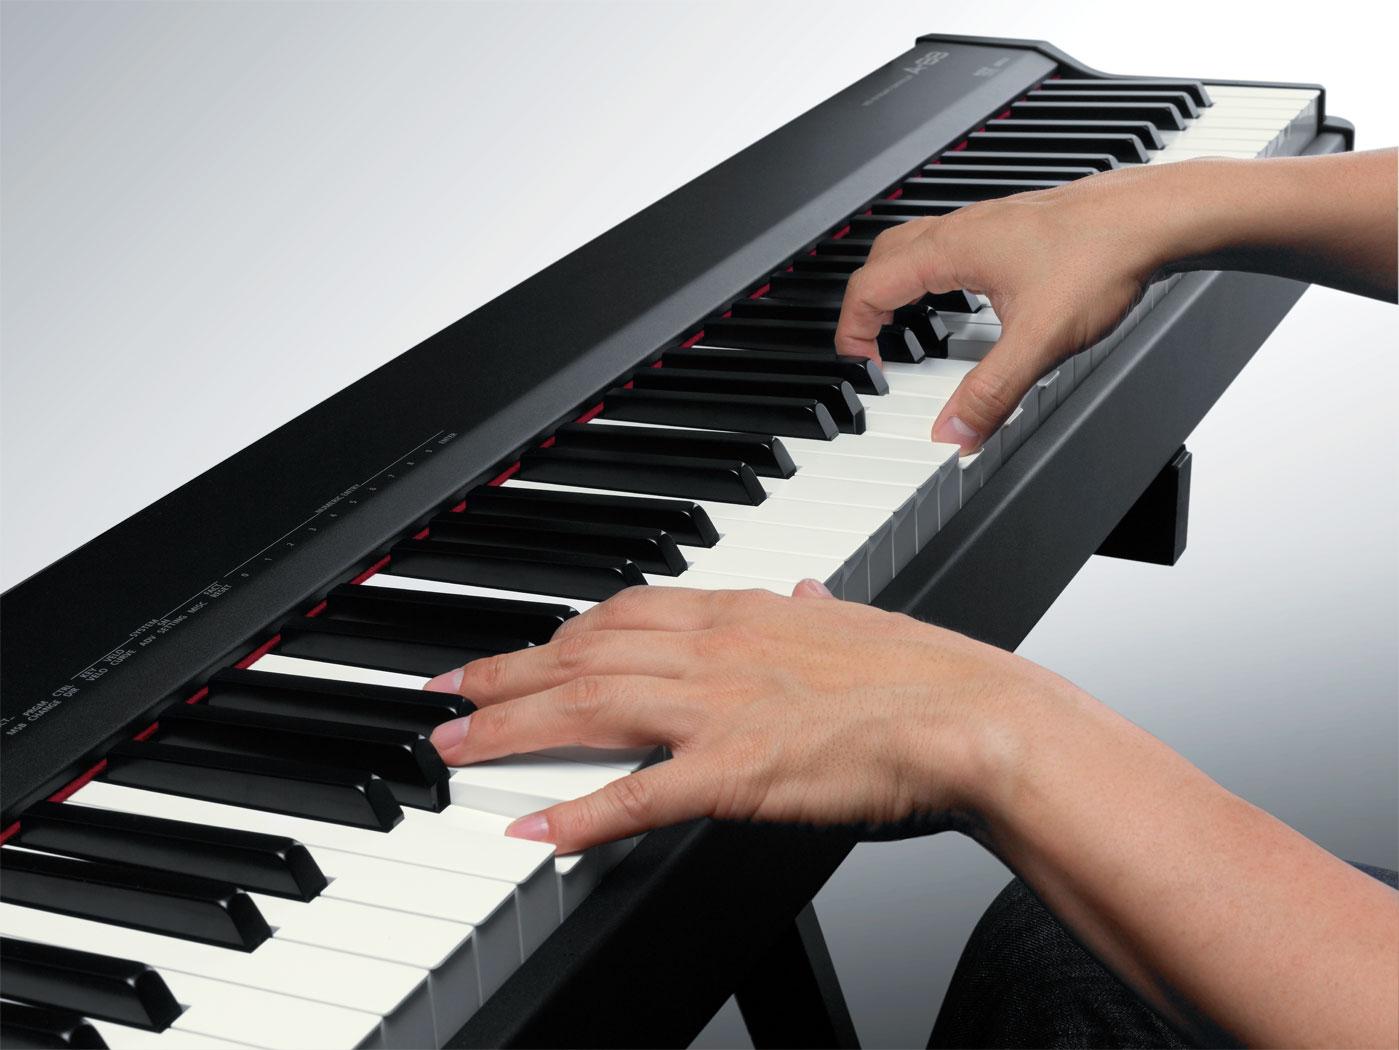 roland a 88 midi keyboard controller. Black Bedroom Furniture Sets. Home Design Ideas